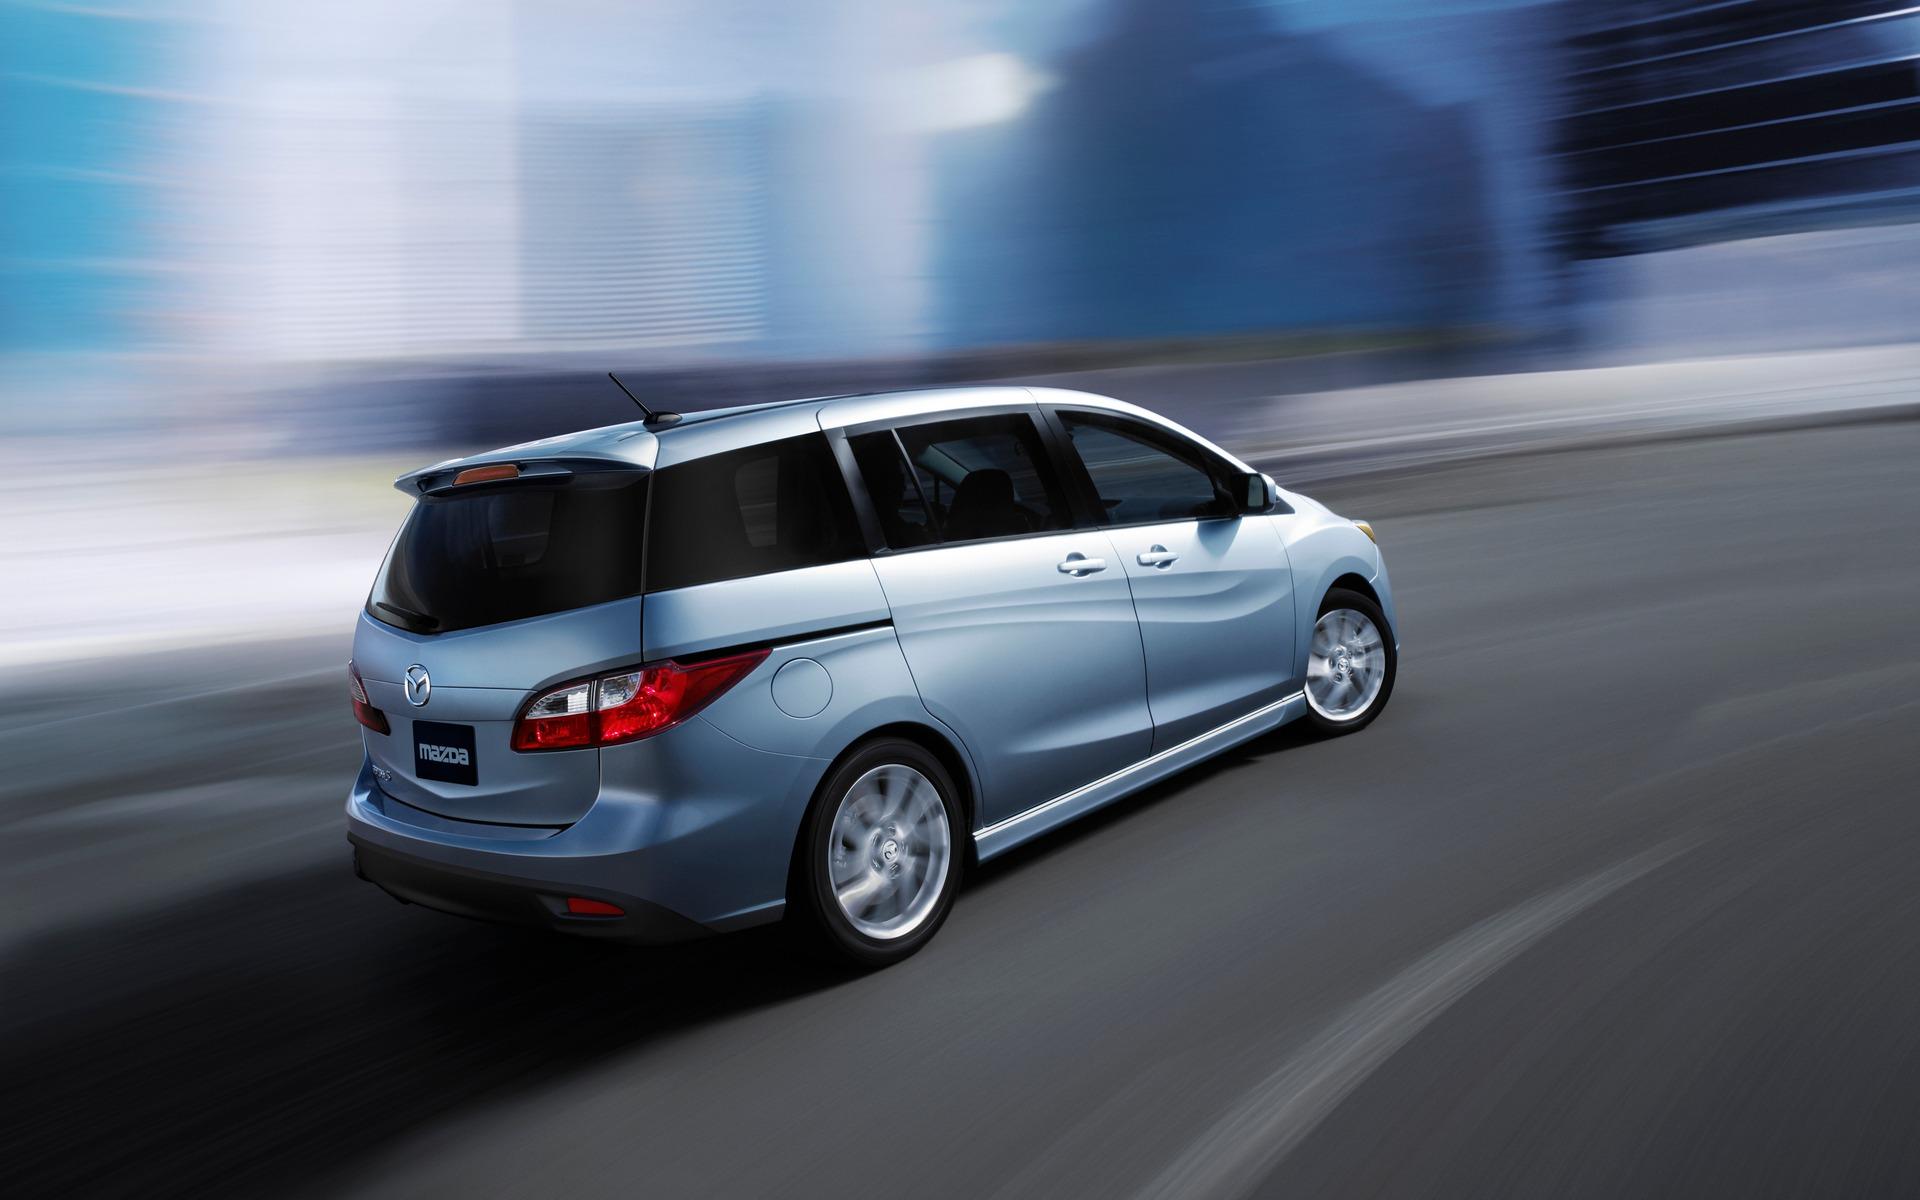 Mazda 5 Reviews >> 2017 Mazda Mazda5 photos - 2/3 - The Car Guide